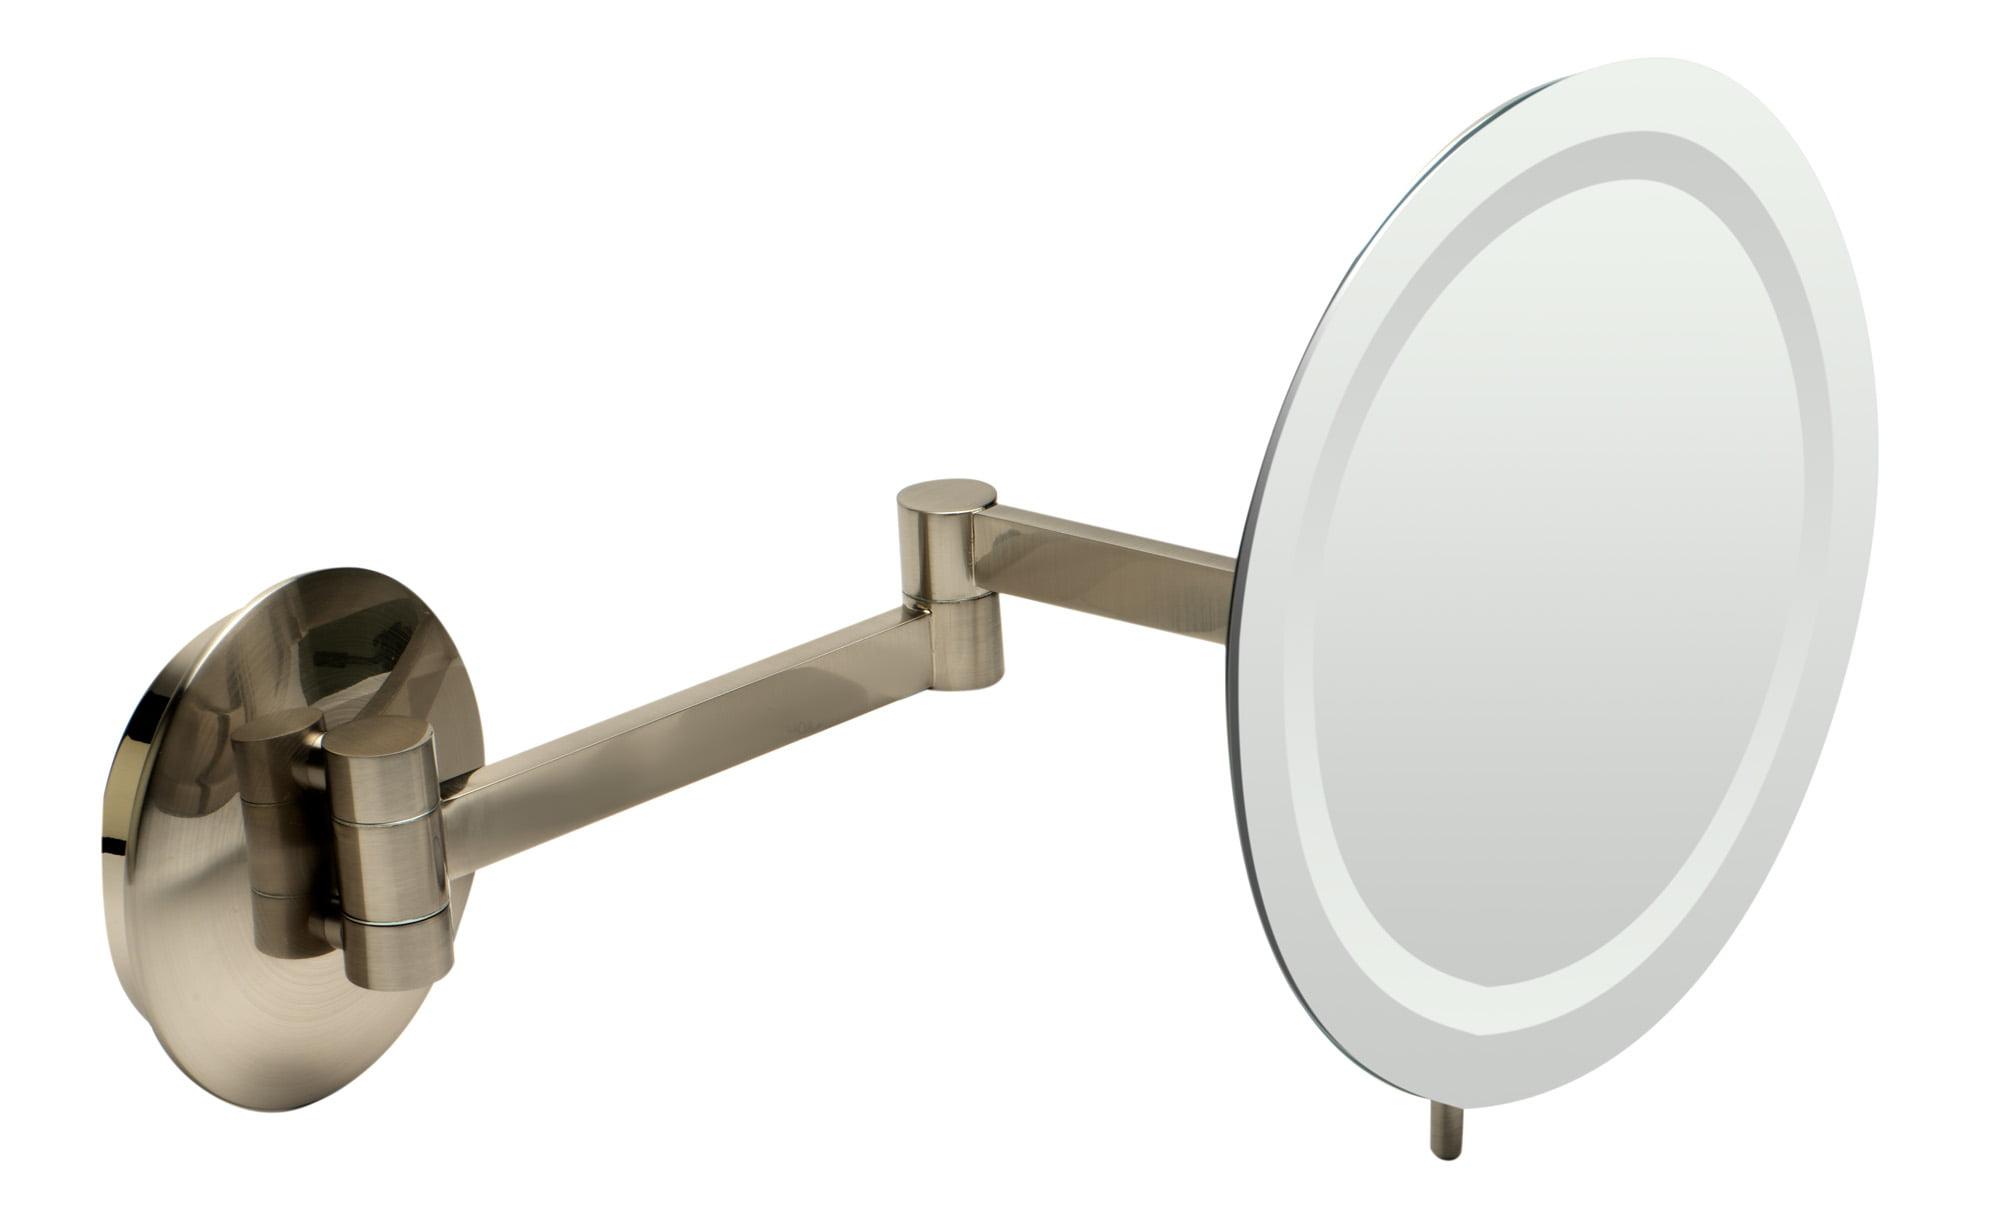 Alfi Brand Abm9wled Bn Brushed Nickel Wall Mount Round 9 5x Magnifying Cosmetic Mirror With Light Walmart Com Walmart Com